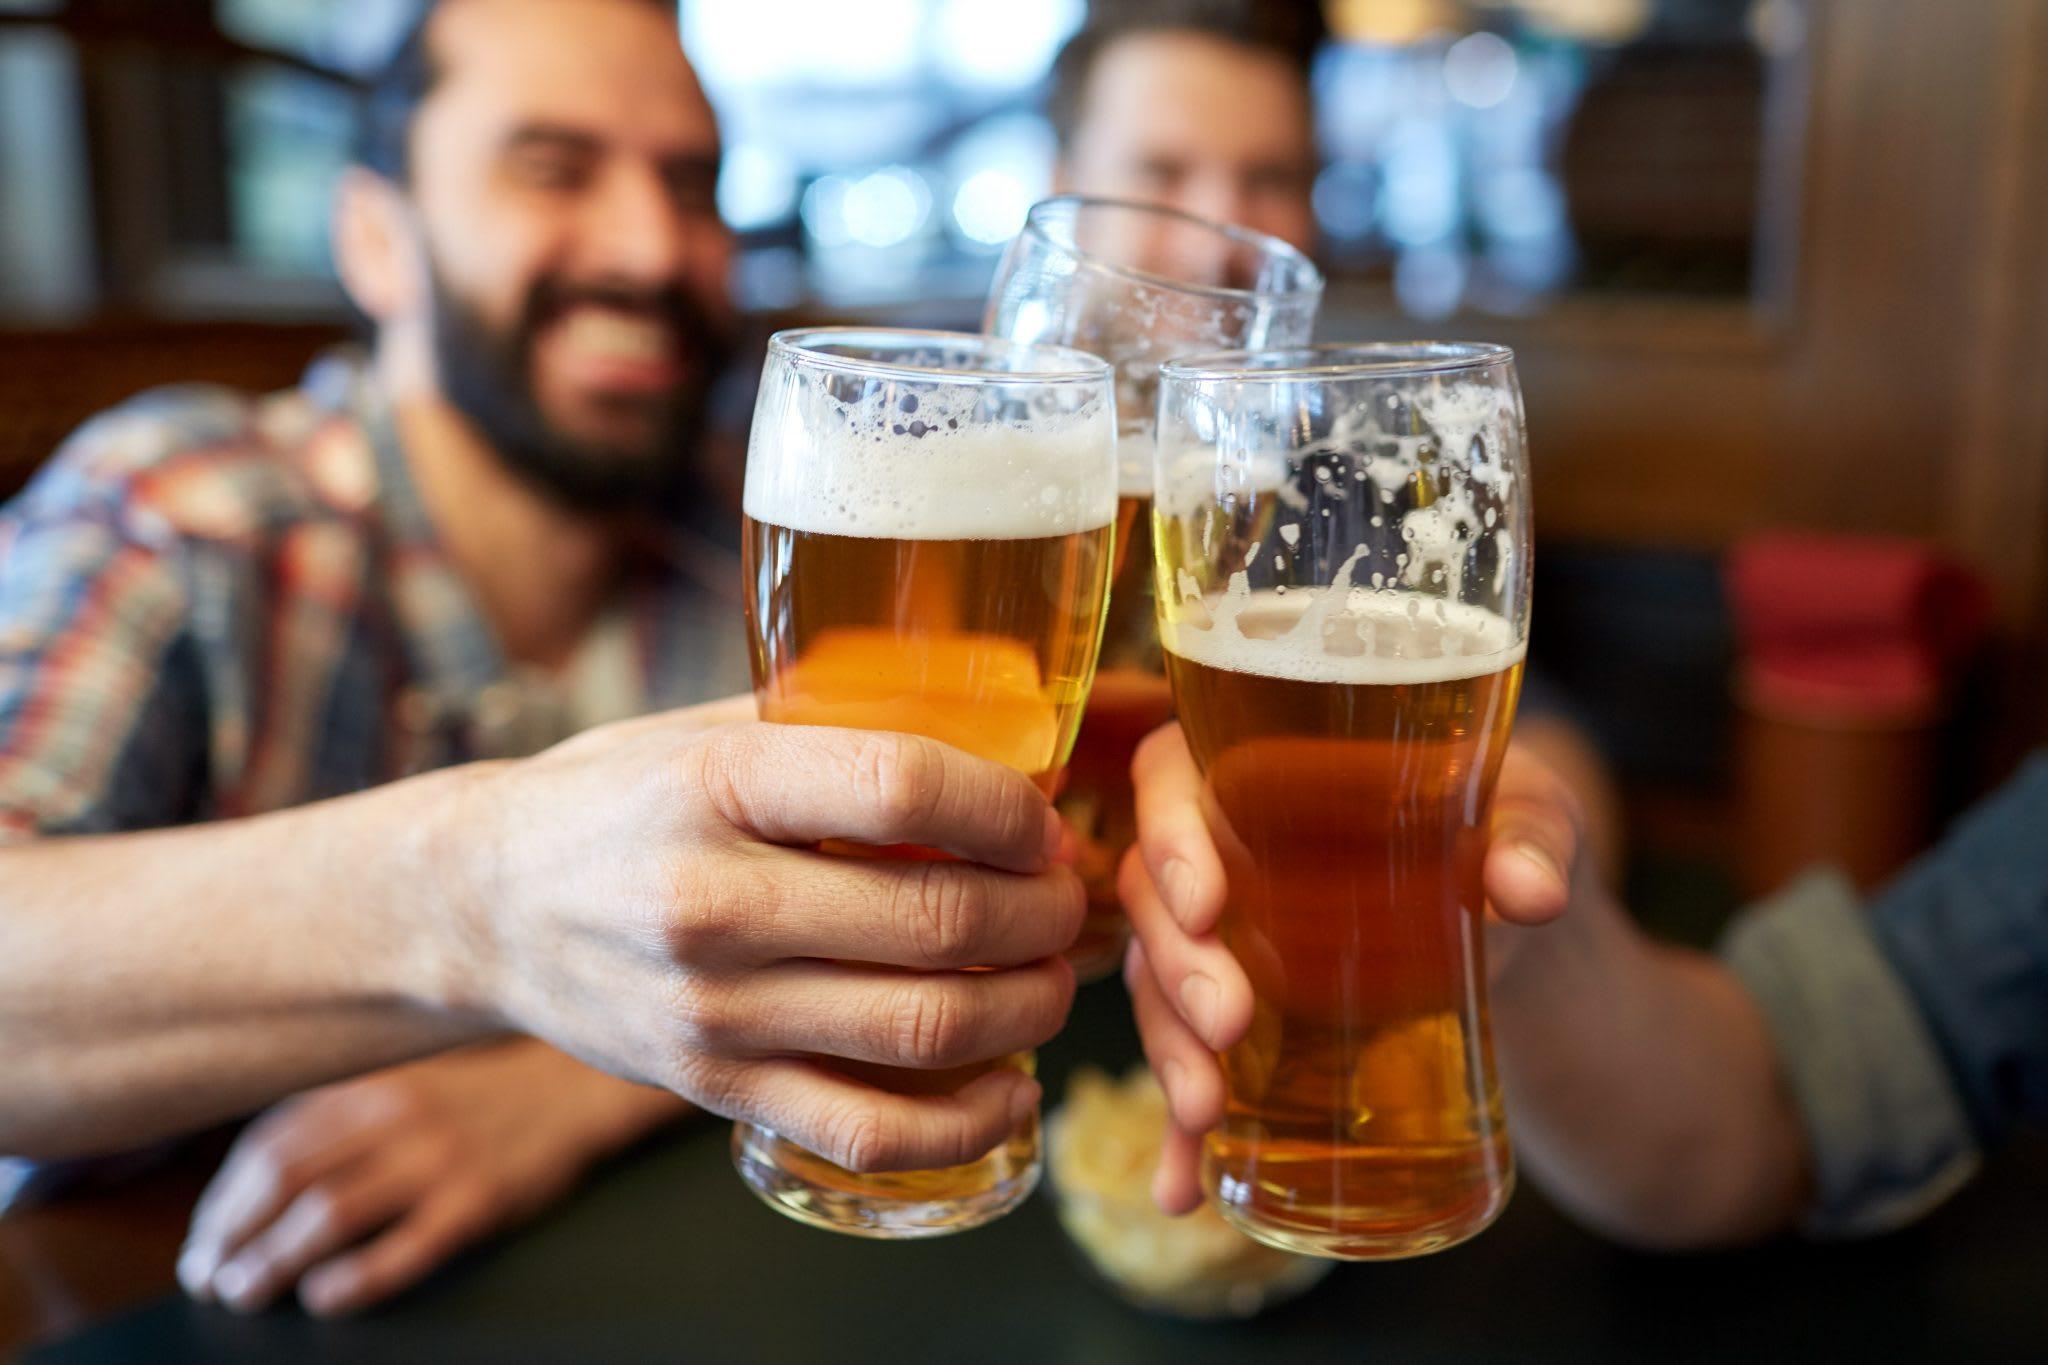 10 Top Selling Beers Of 2019 So Far (Based On Sales Data)